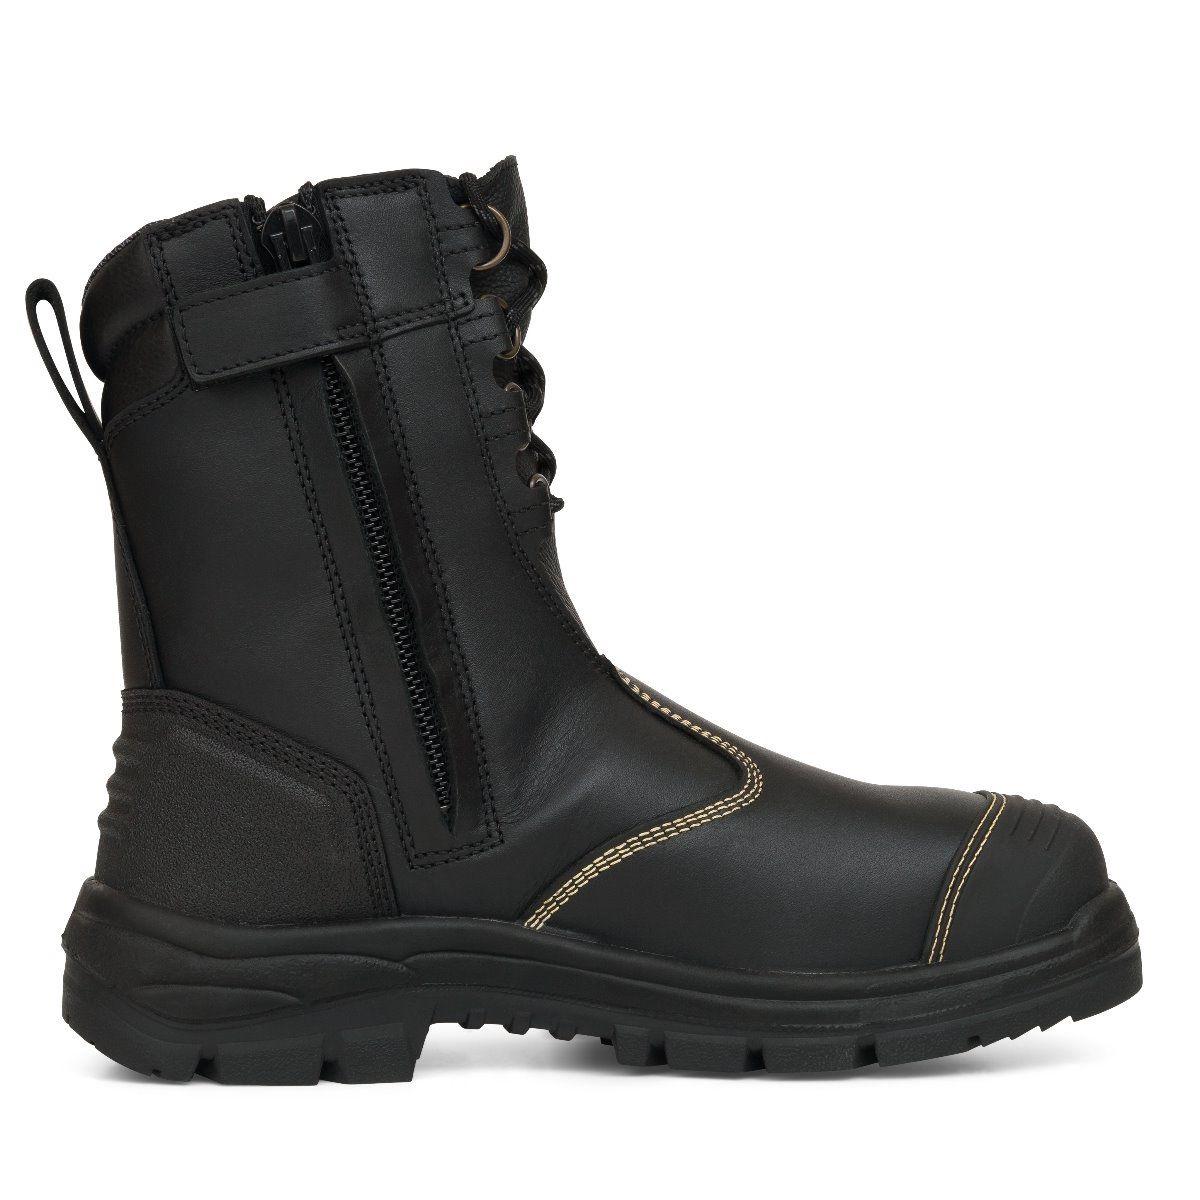 55-380_oliver_at_55_series__200mm_black_zip_side_lace_up_boot_left_hr_2_